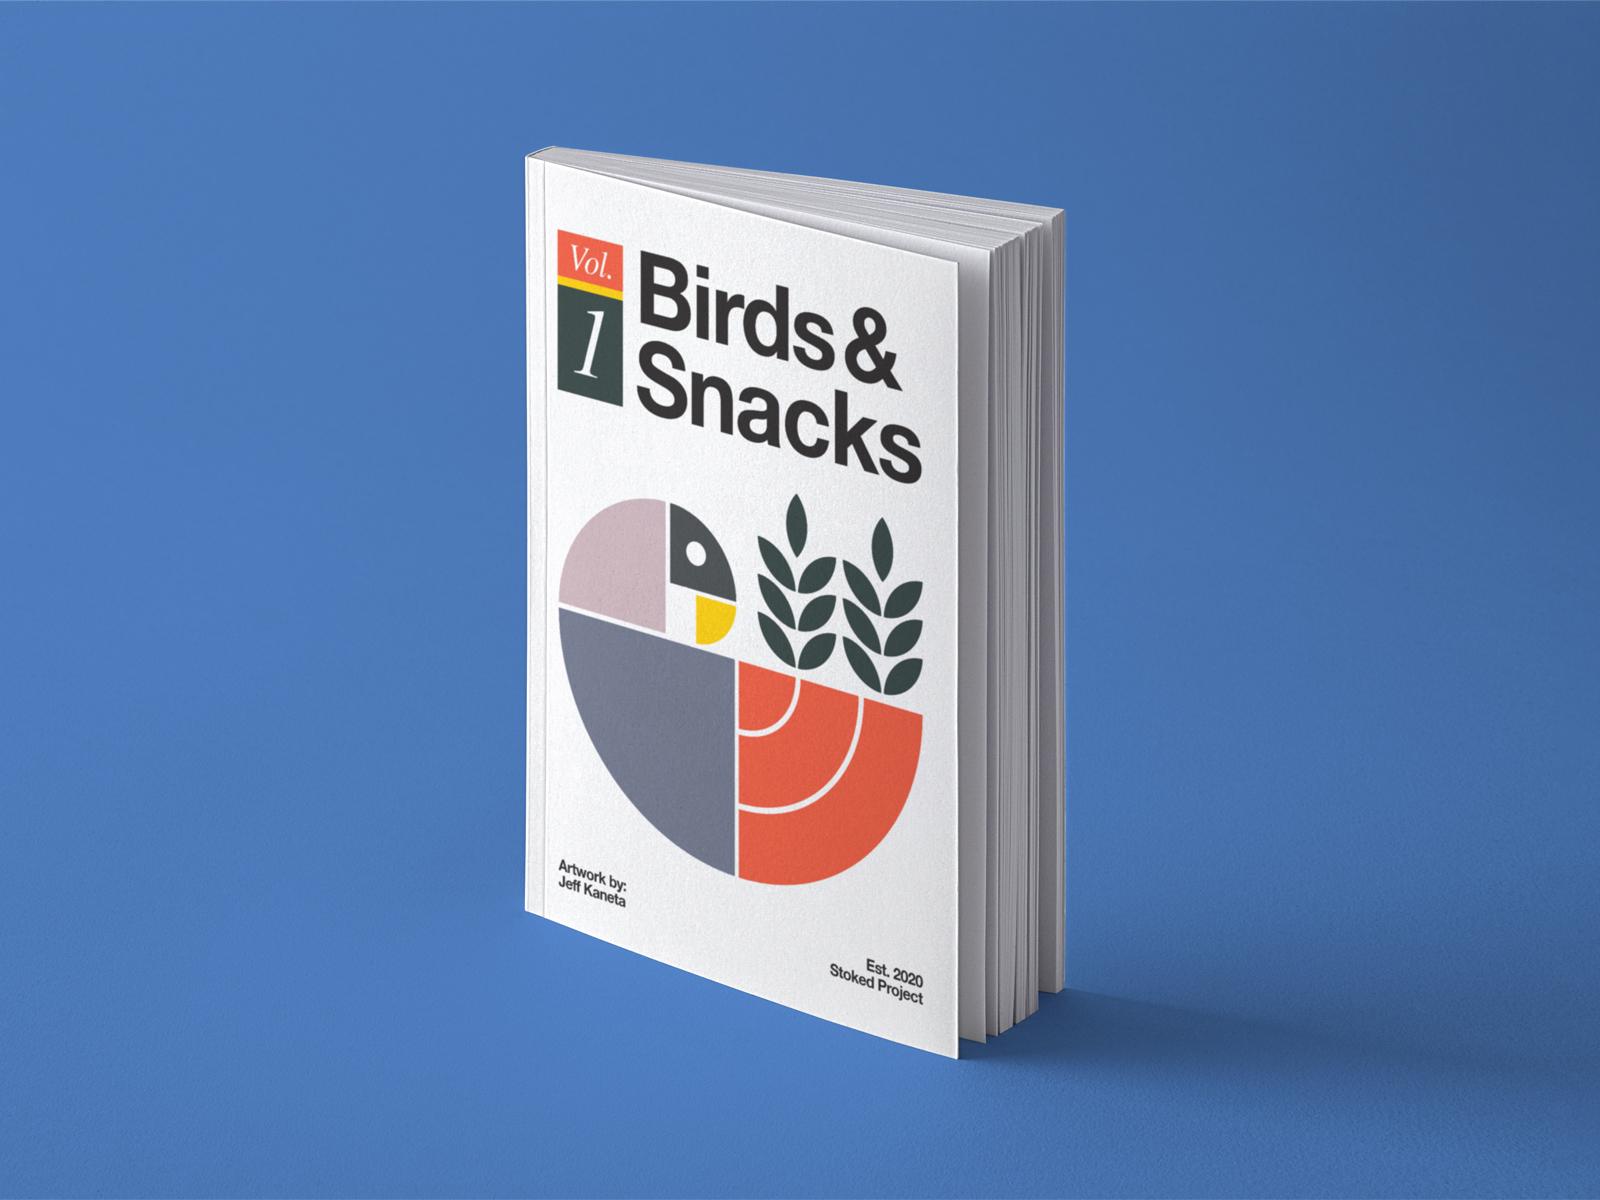 Birds & Snacks